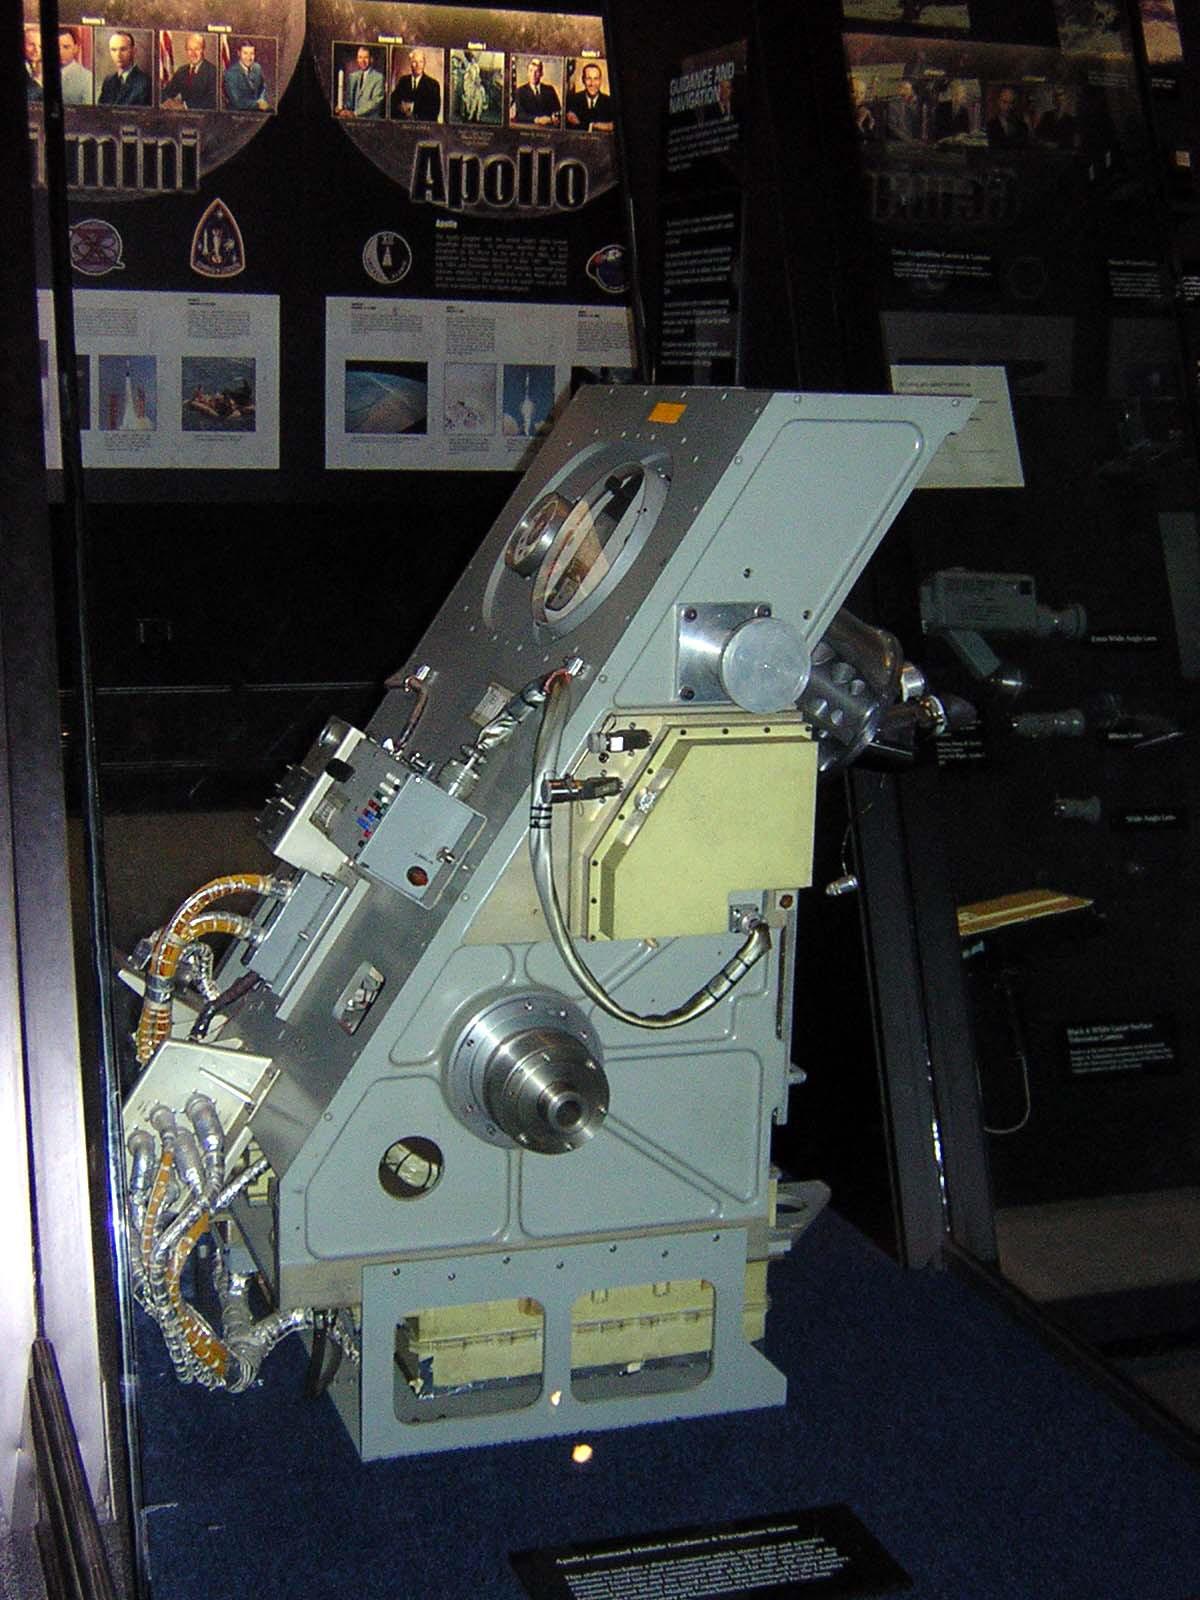 Apollo Guidance System